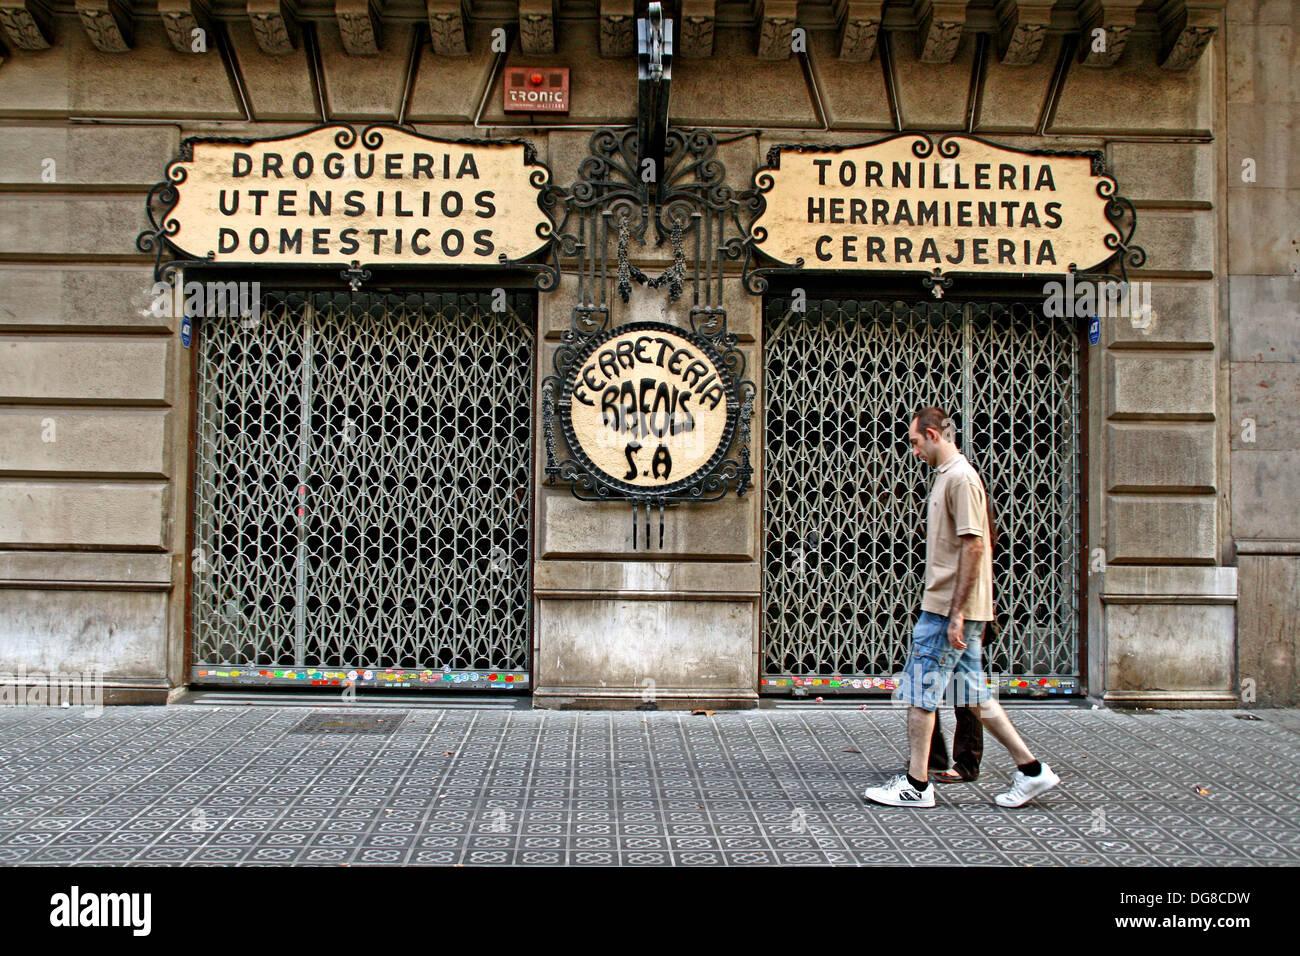 Hardware, drugstore, fasteners, Barcelona, Catalonia, Spain. - Stock Image